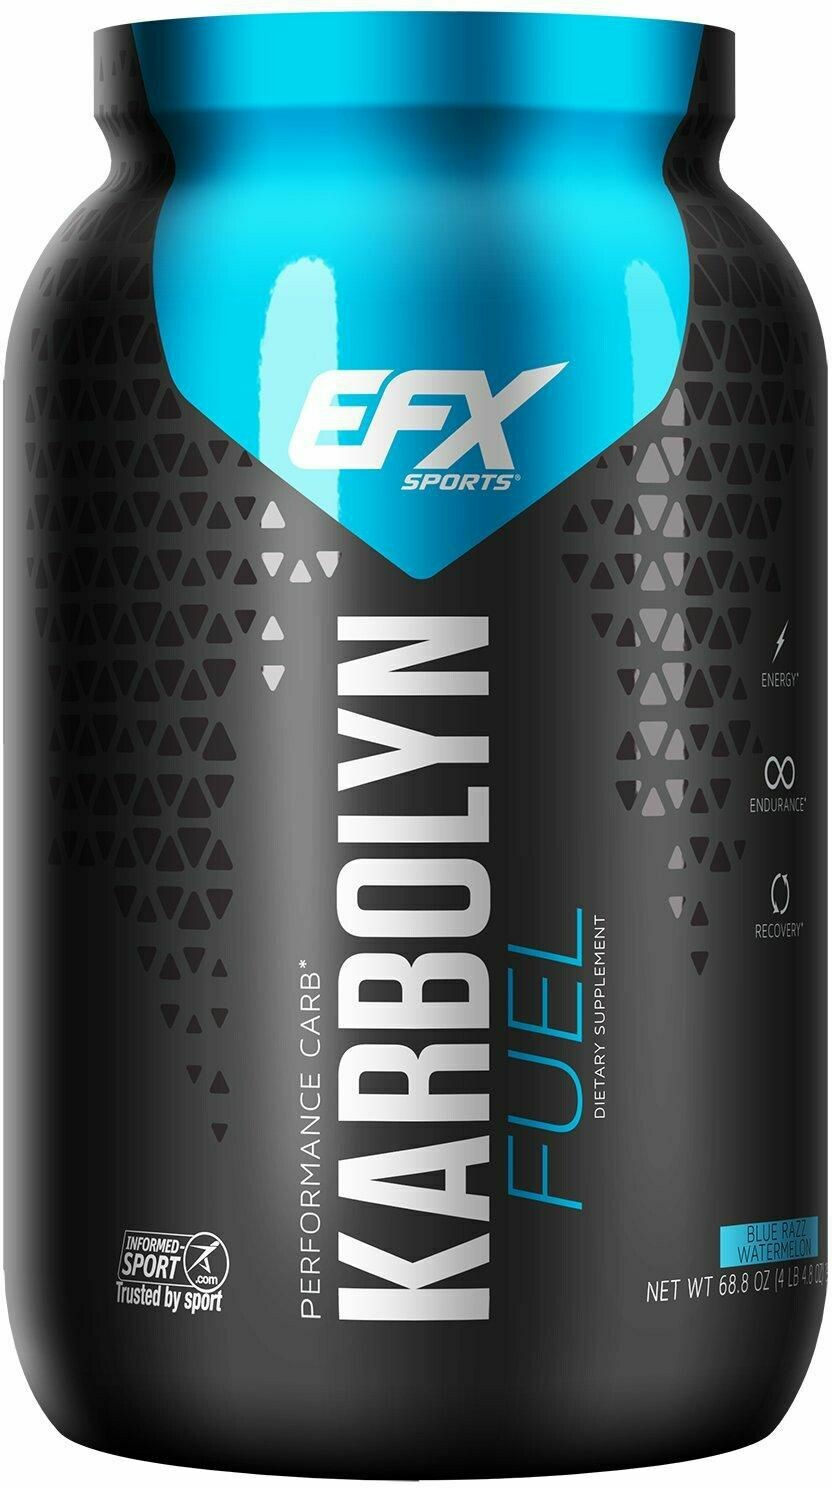 EFX Karbolyn Fuel 4.4lb